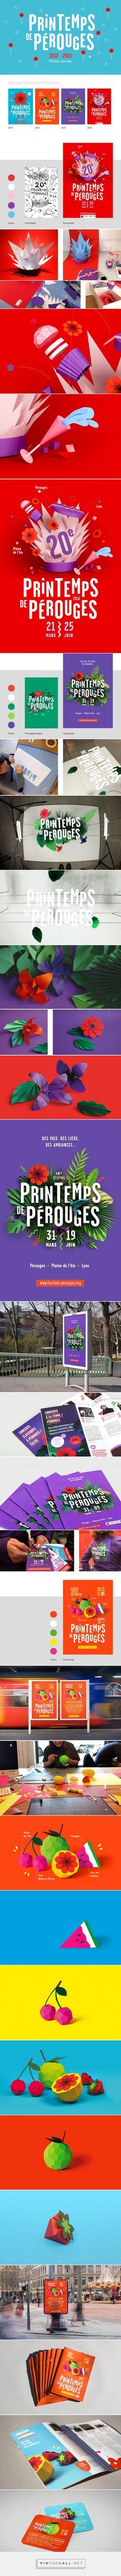 Spring Festival Poster Series on Behance - created via https://pinthemall.net